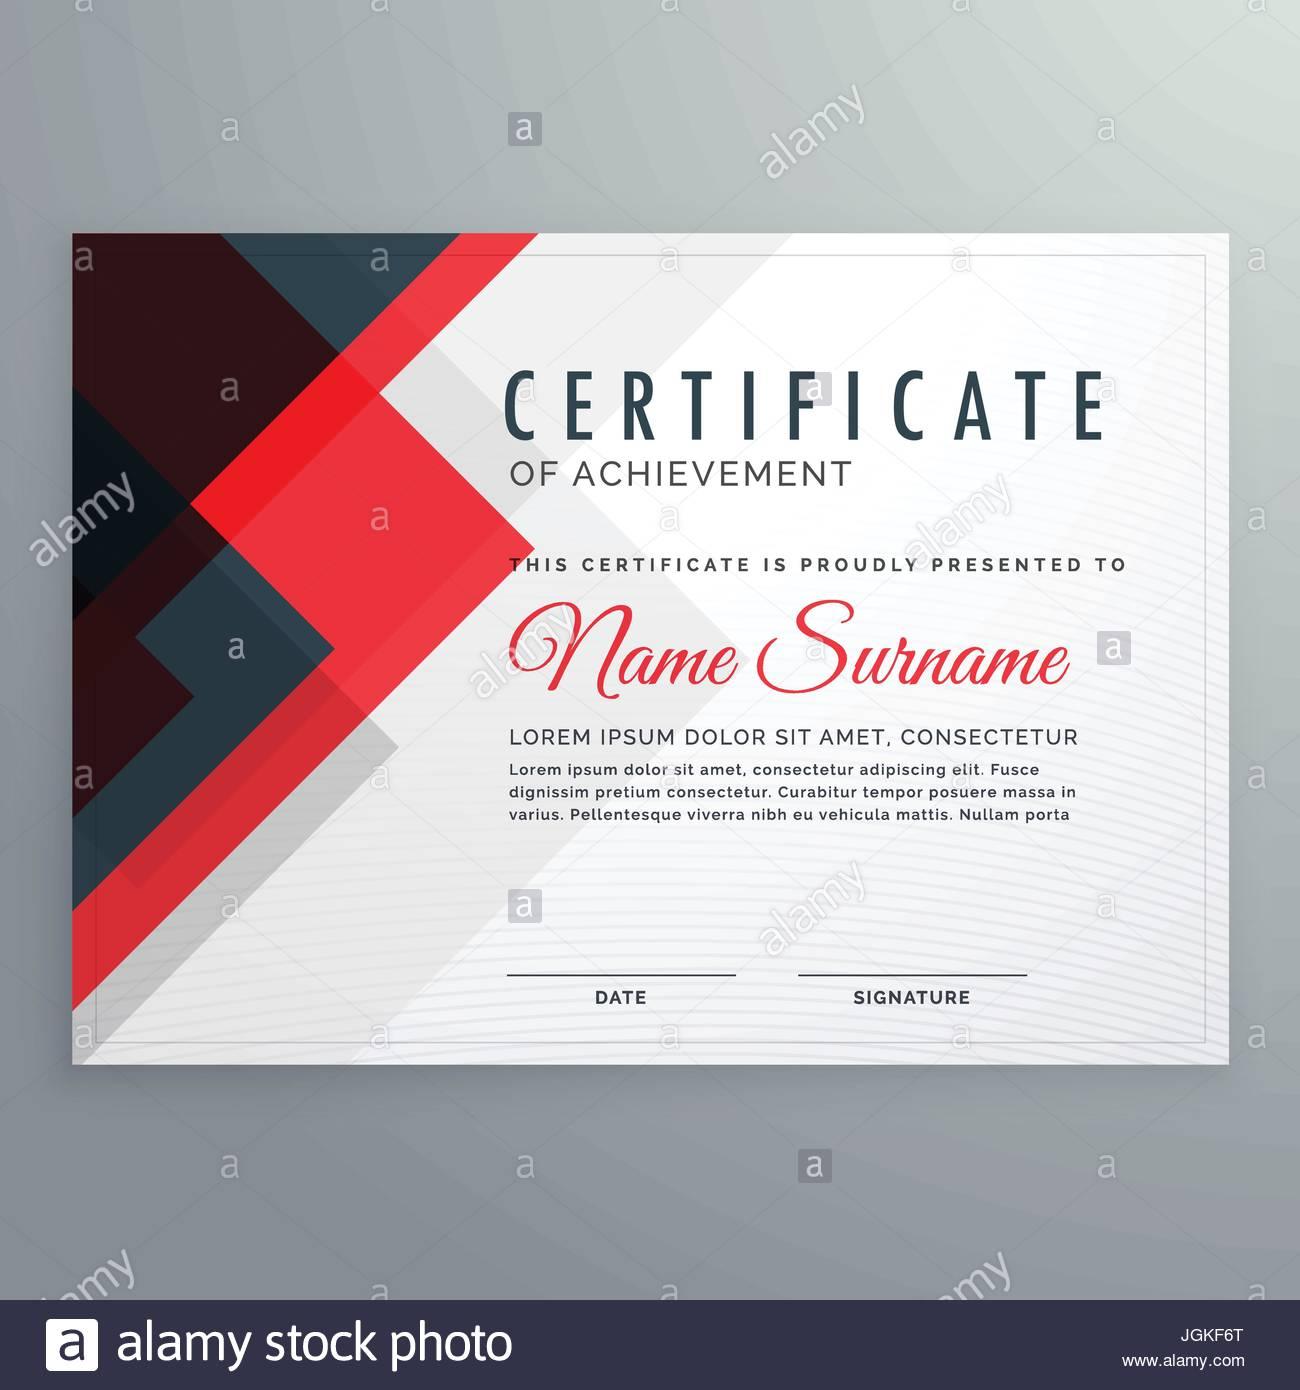 Award Template | Kreative Zertifikat Achievement Award Templates Mit Rot Und Ahnung